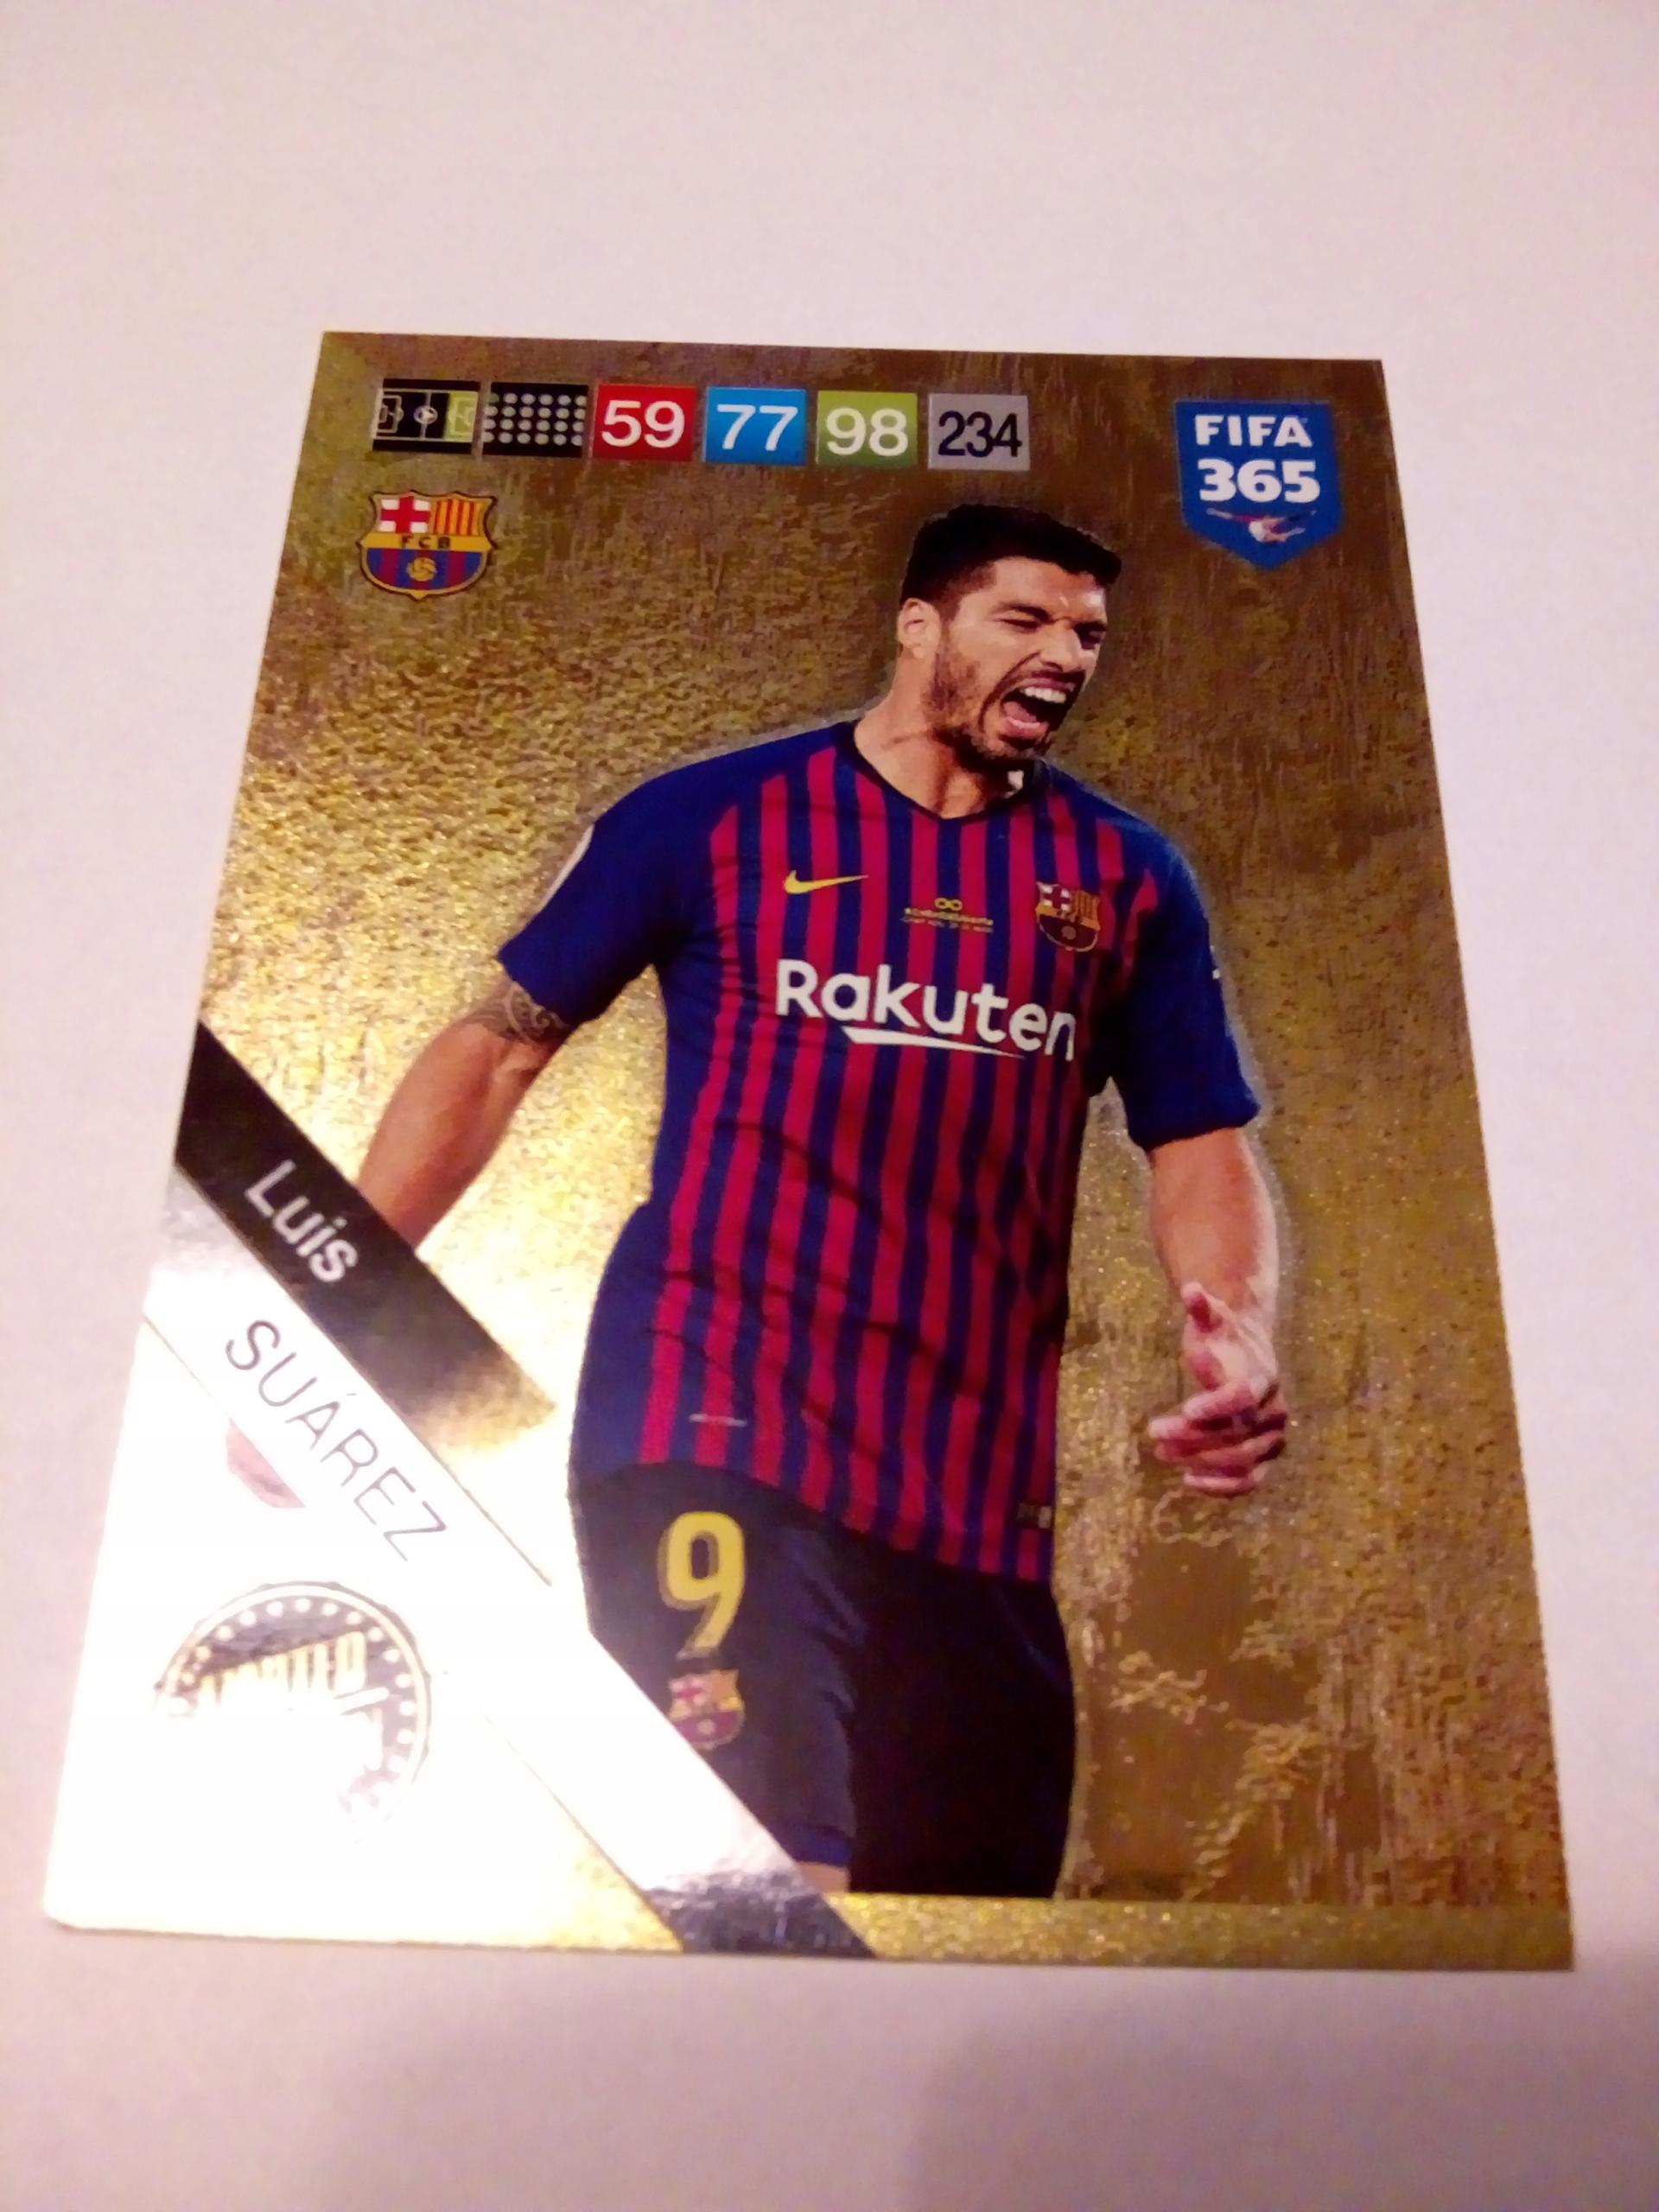 Karta Limited Luis Suarez- FIFA 365 2019